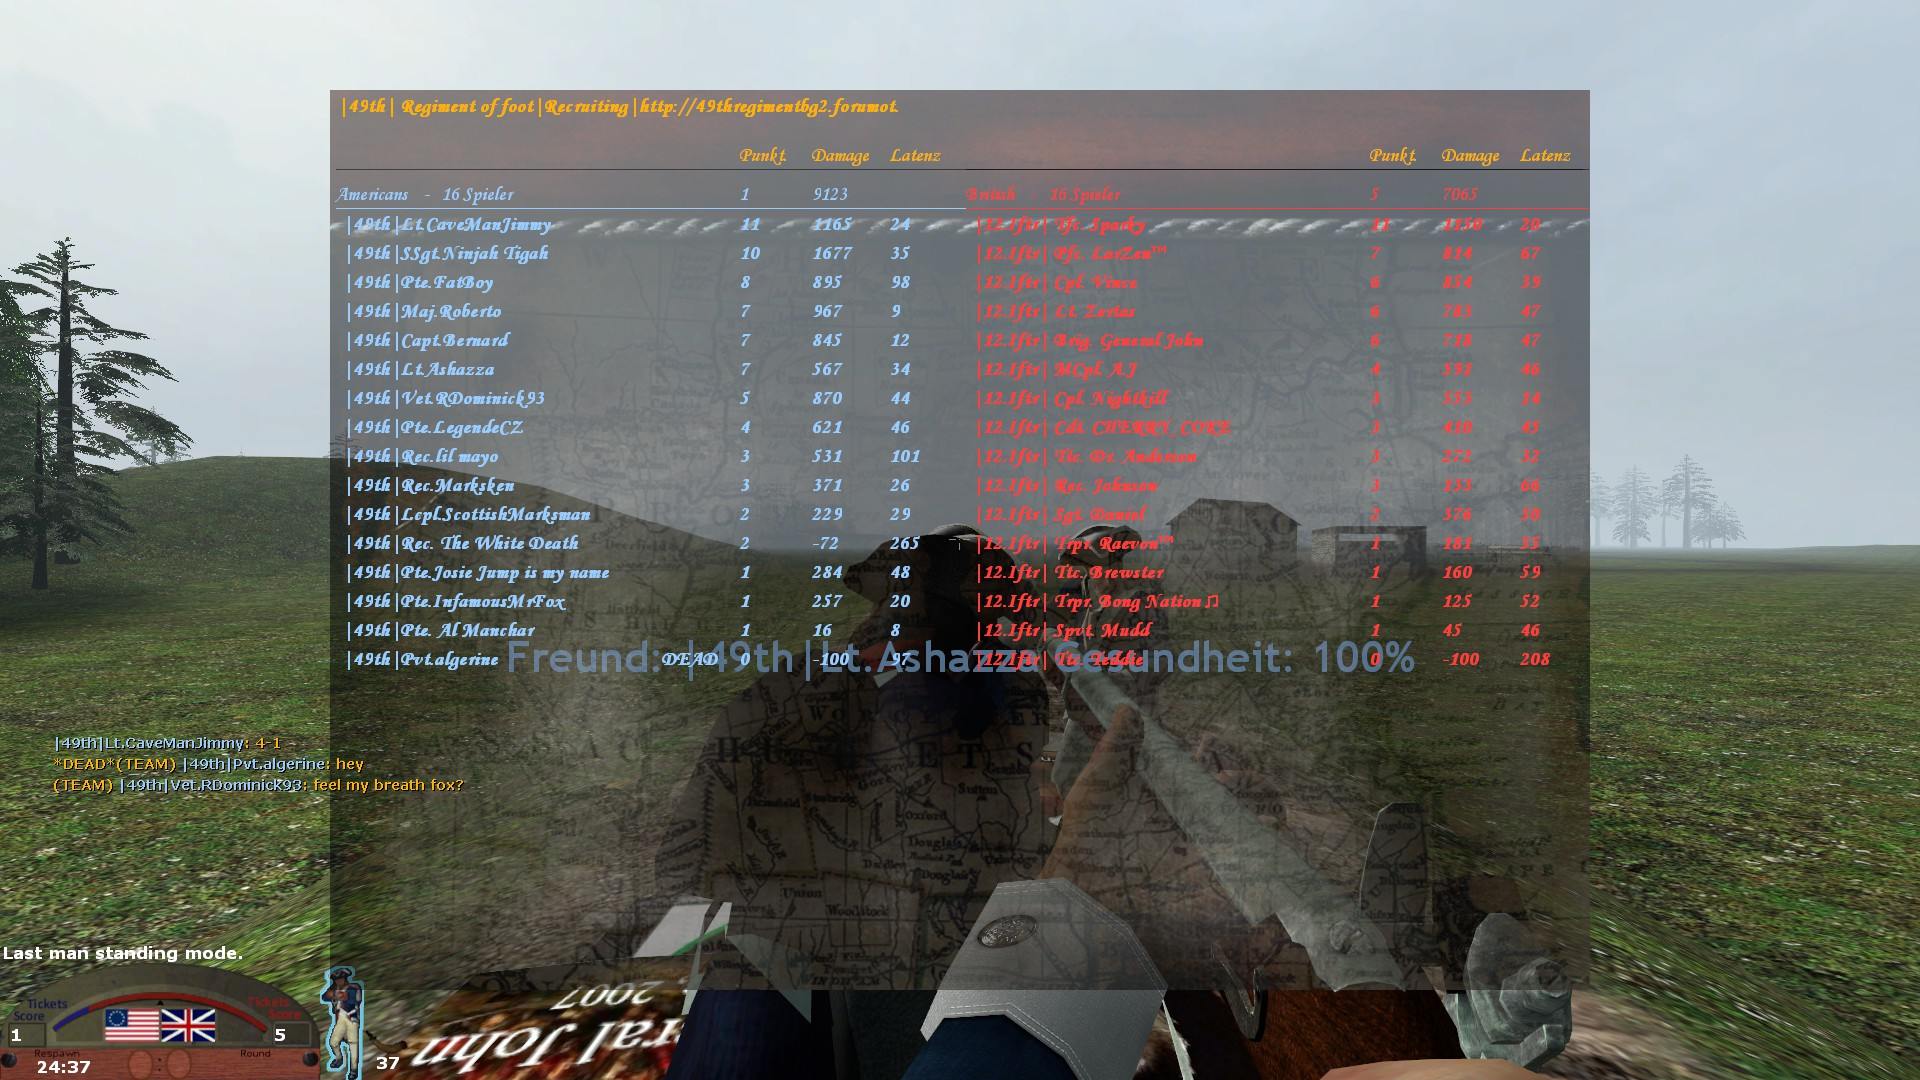 12.Iftr vs 49th Linebattle  D0DF4D38546745E0B479B4FAF1C98D61CAFF03B4